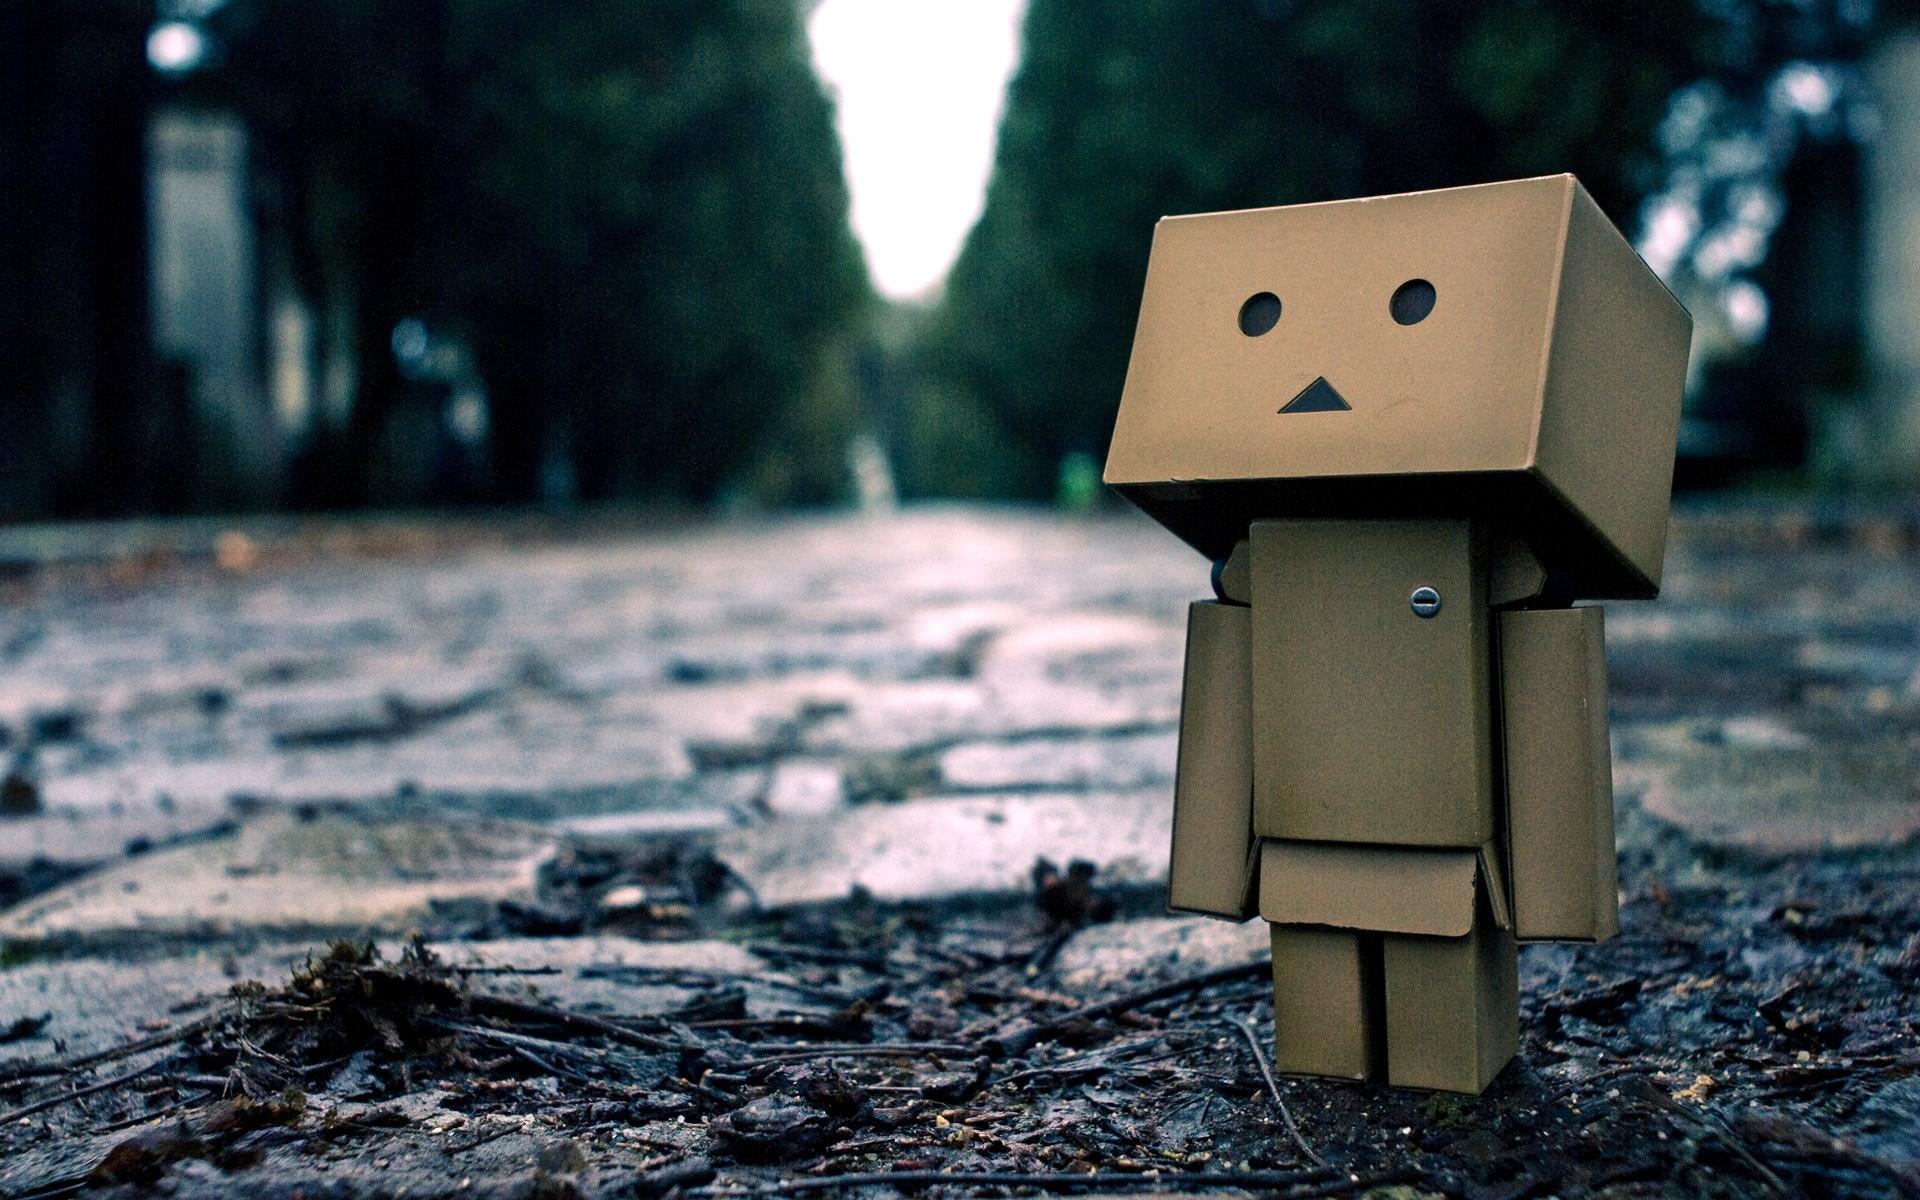 sfondi tristi